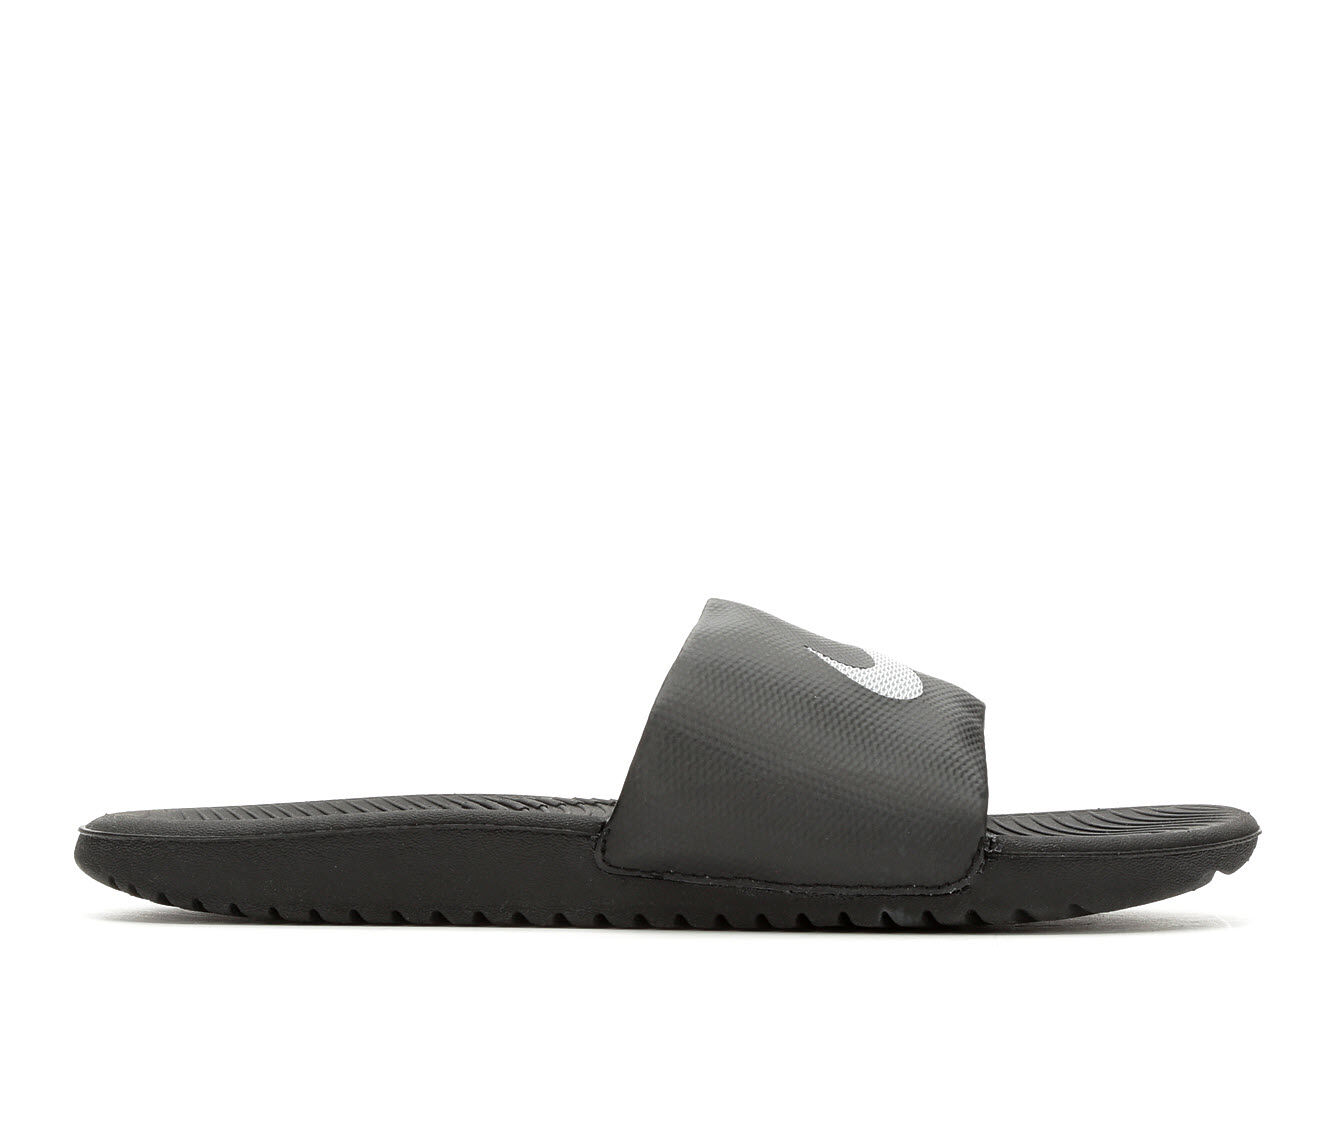 uk shoes_kd6796